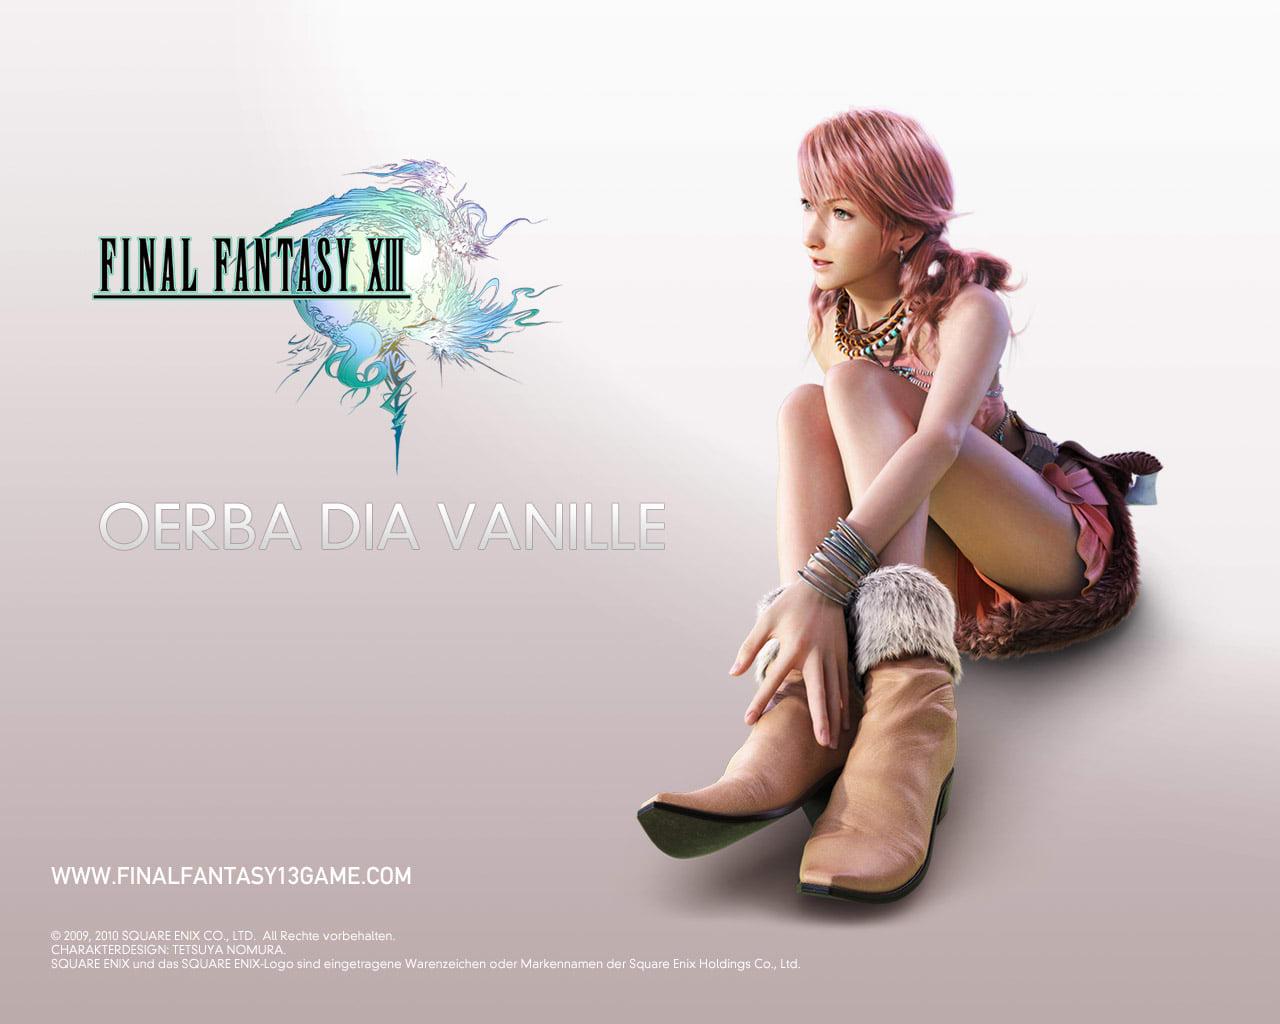 Final Fantasy 13 Wallpaper: Oerba Dia Vanille